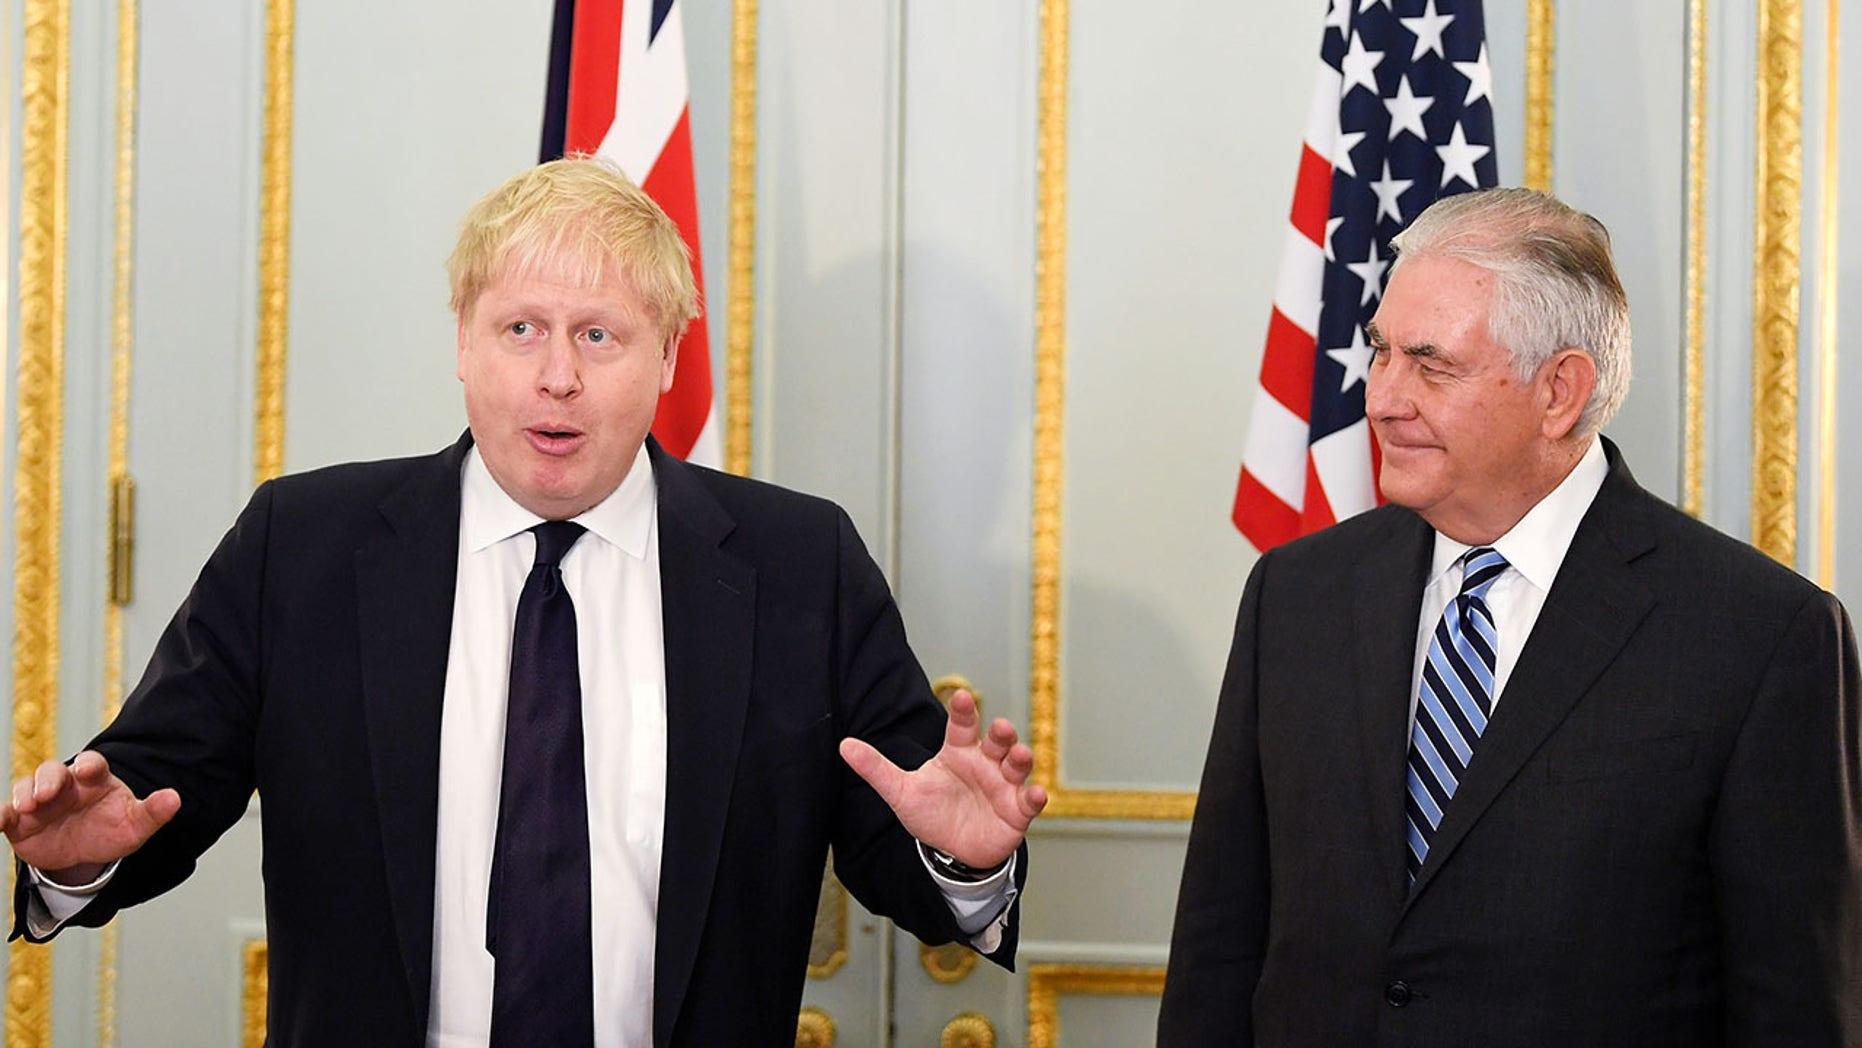 U.K. Foreign Secretary Boris Johnson greeted U.S. Secretary of State Rex Tillerson this week.